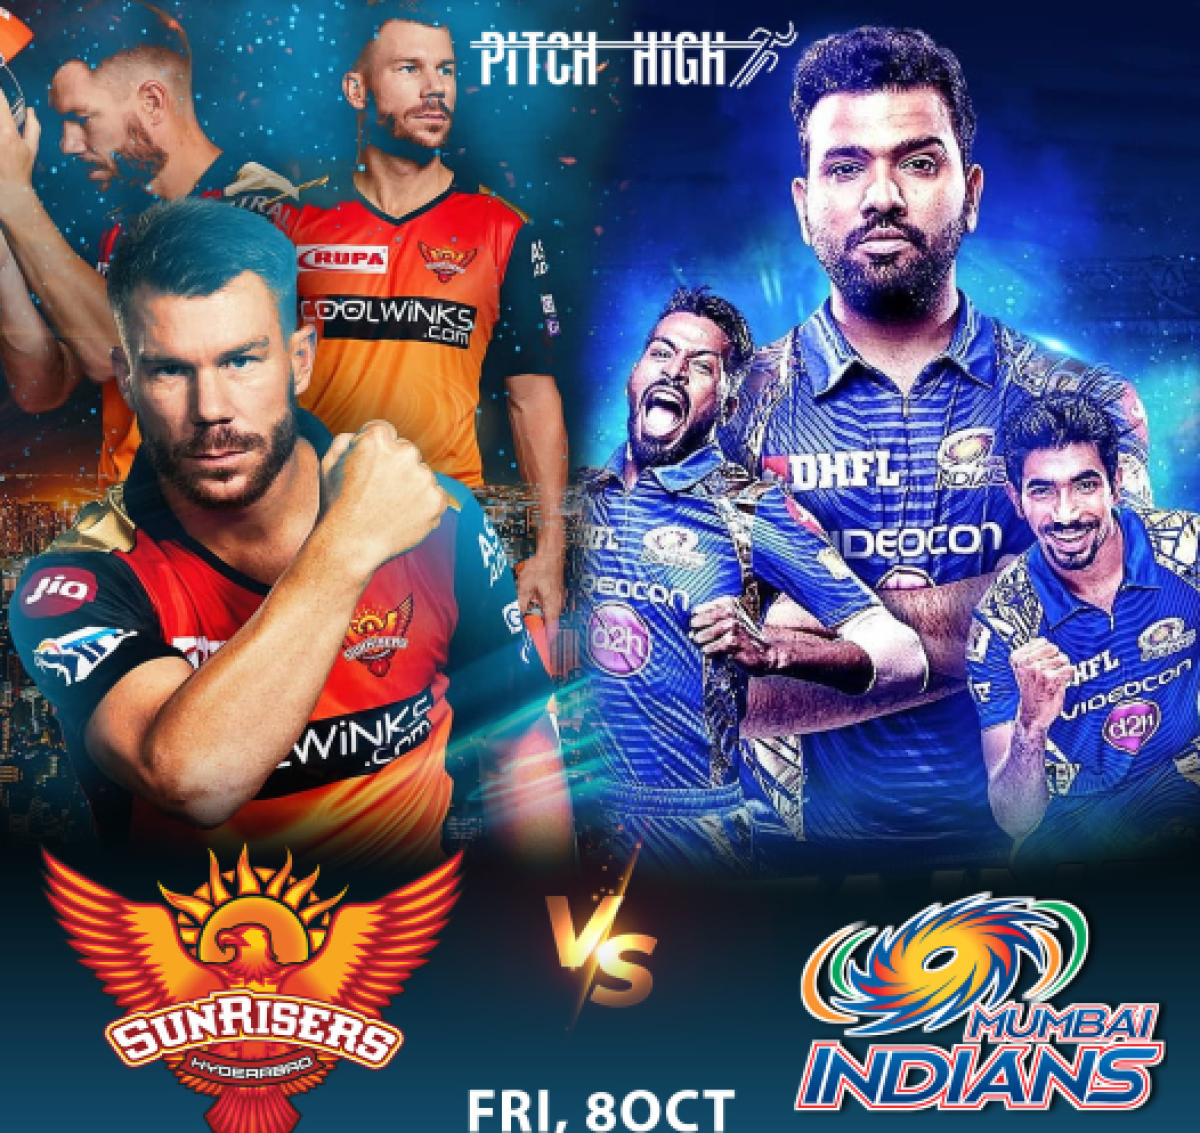 IPL,IPL news,cricket,cricket wireless,cricket score,cricket live score,cricket india,how cricket is played,cricket ipl,Sunrisers Hyderabad vs Mumbai Indians,SRH vs MI Dream11 Prediction,SRH vs MI